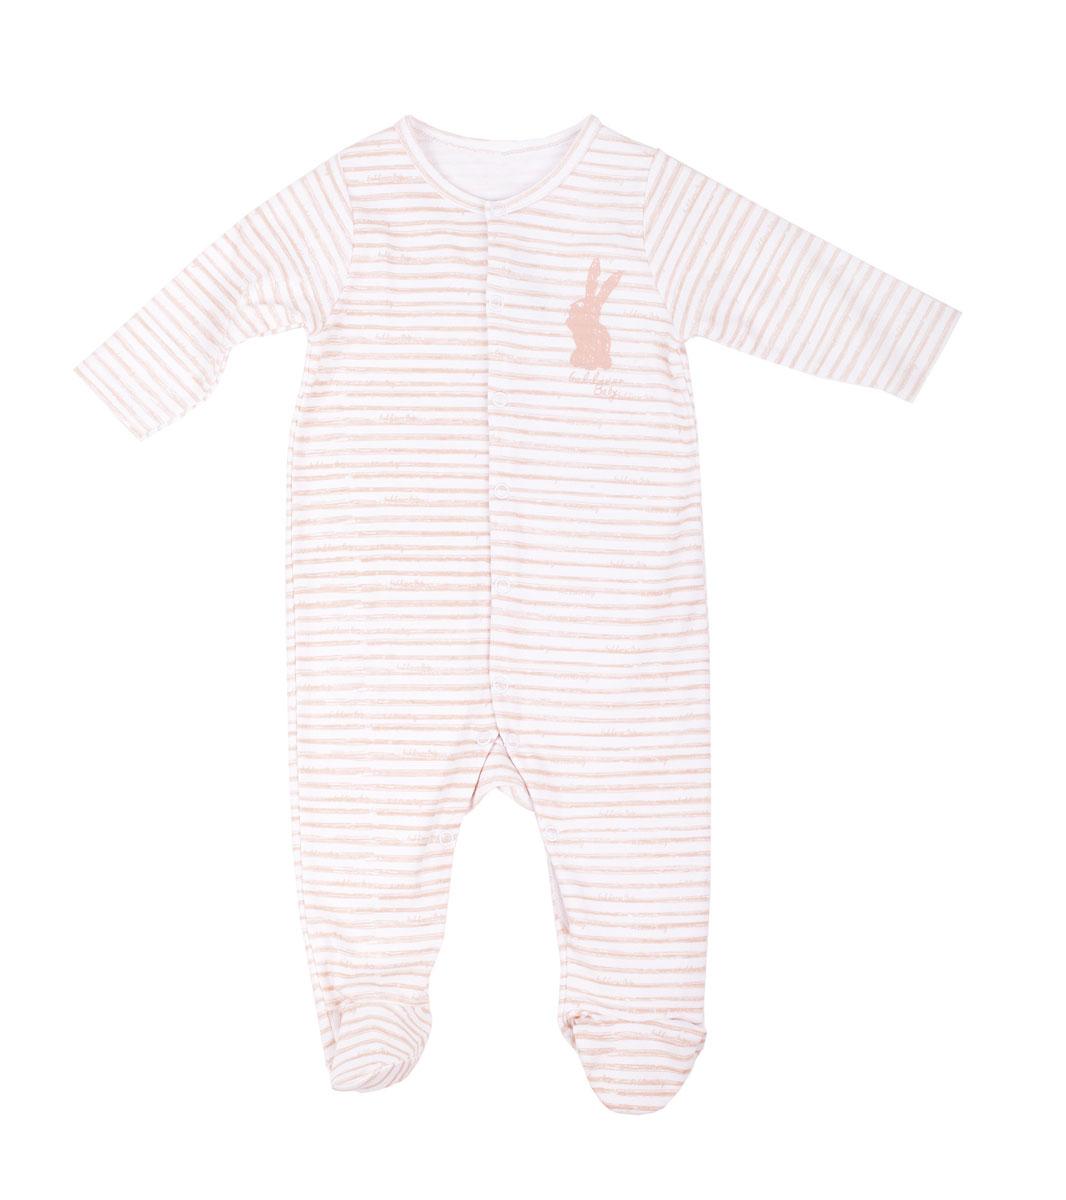 Gulliver Baby ���������� �������. 116 GB UC 5 303